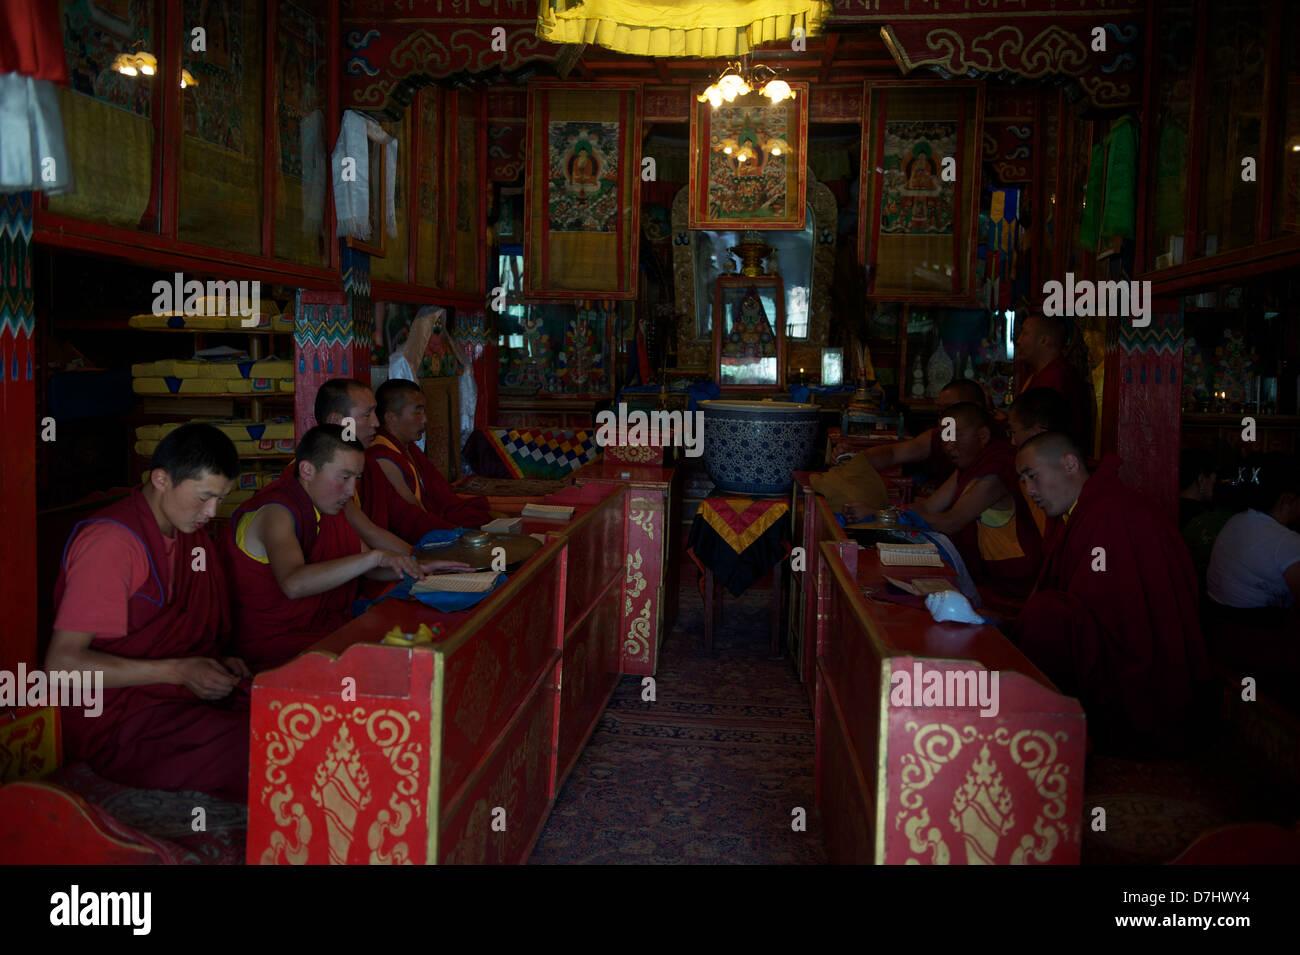 monks at the Erdene zuu monastery - Stock Image